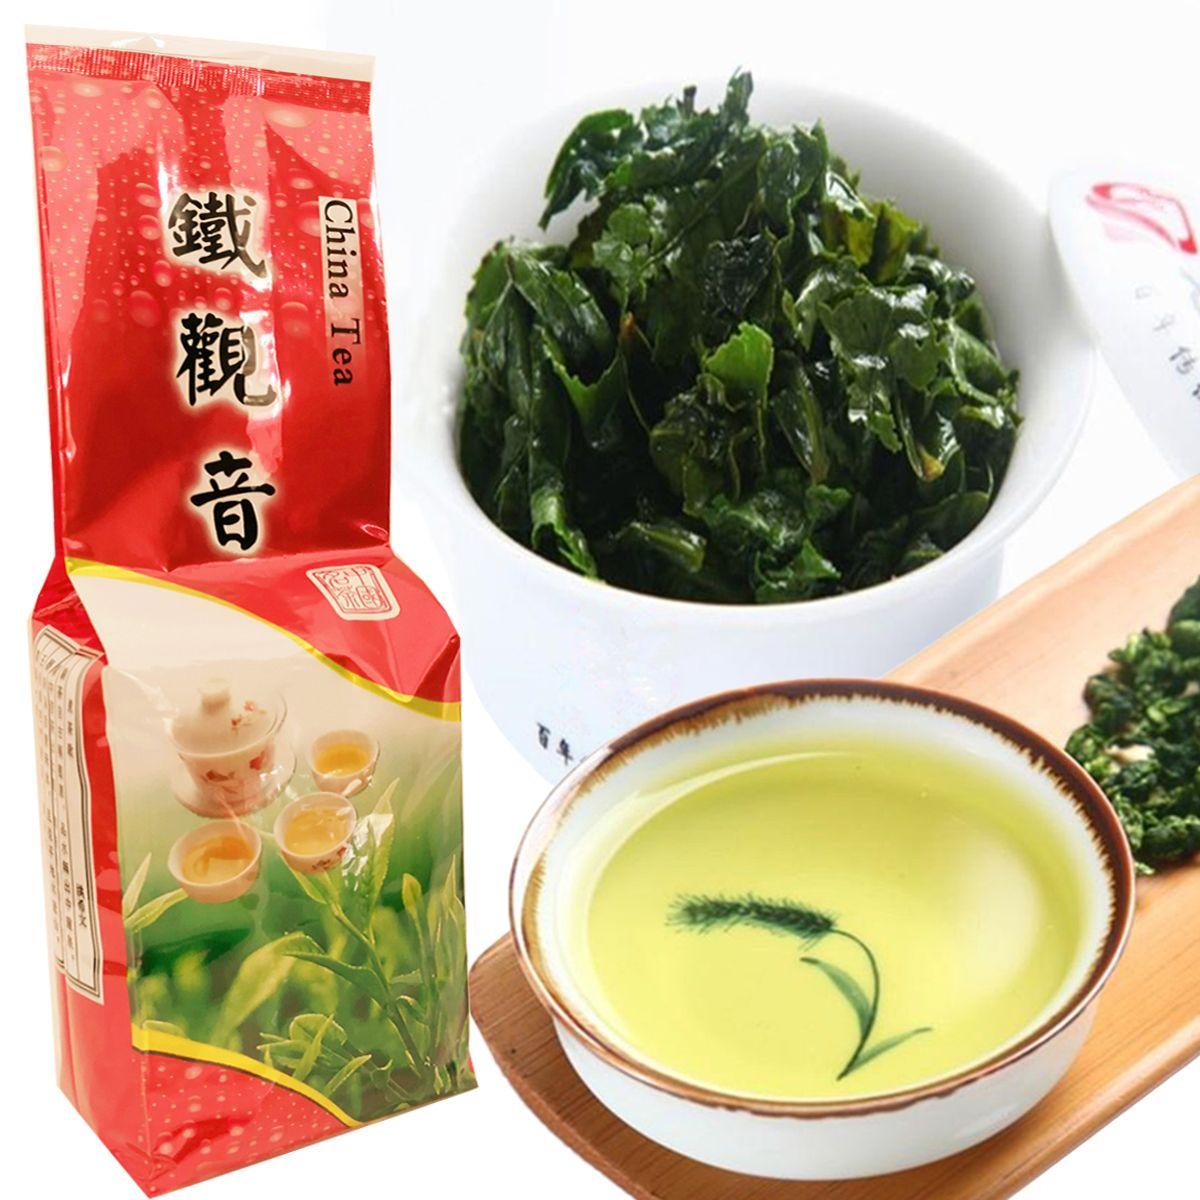 Preferências 250g Organic Chinese Tea Oolong Destaque Saúde Top Grade Anxi Tieguanyin Chá Oolong verde New Spring Green Tea Alimentos